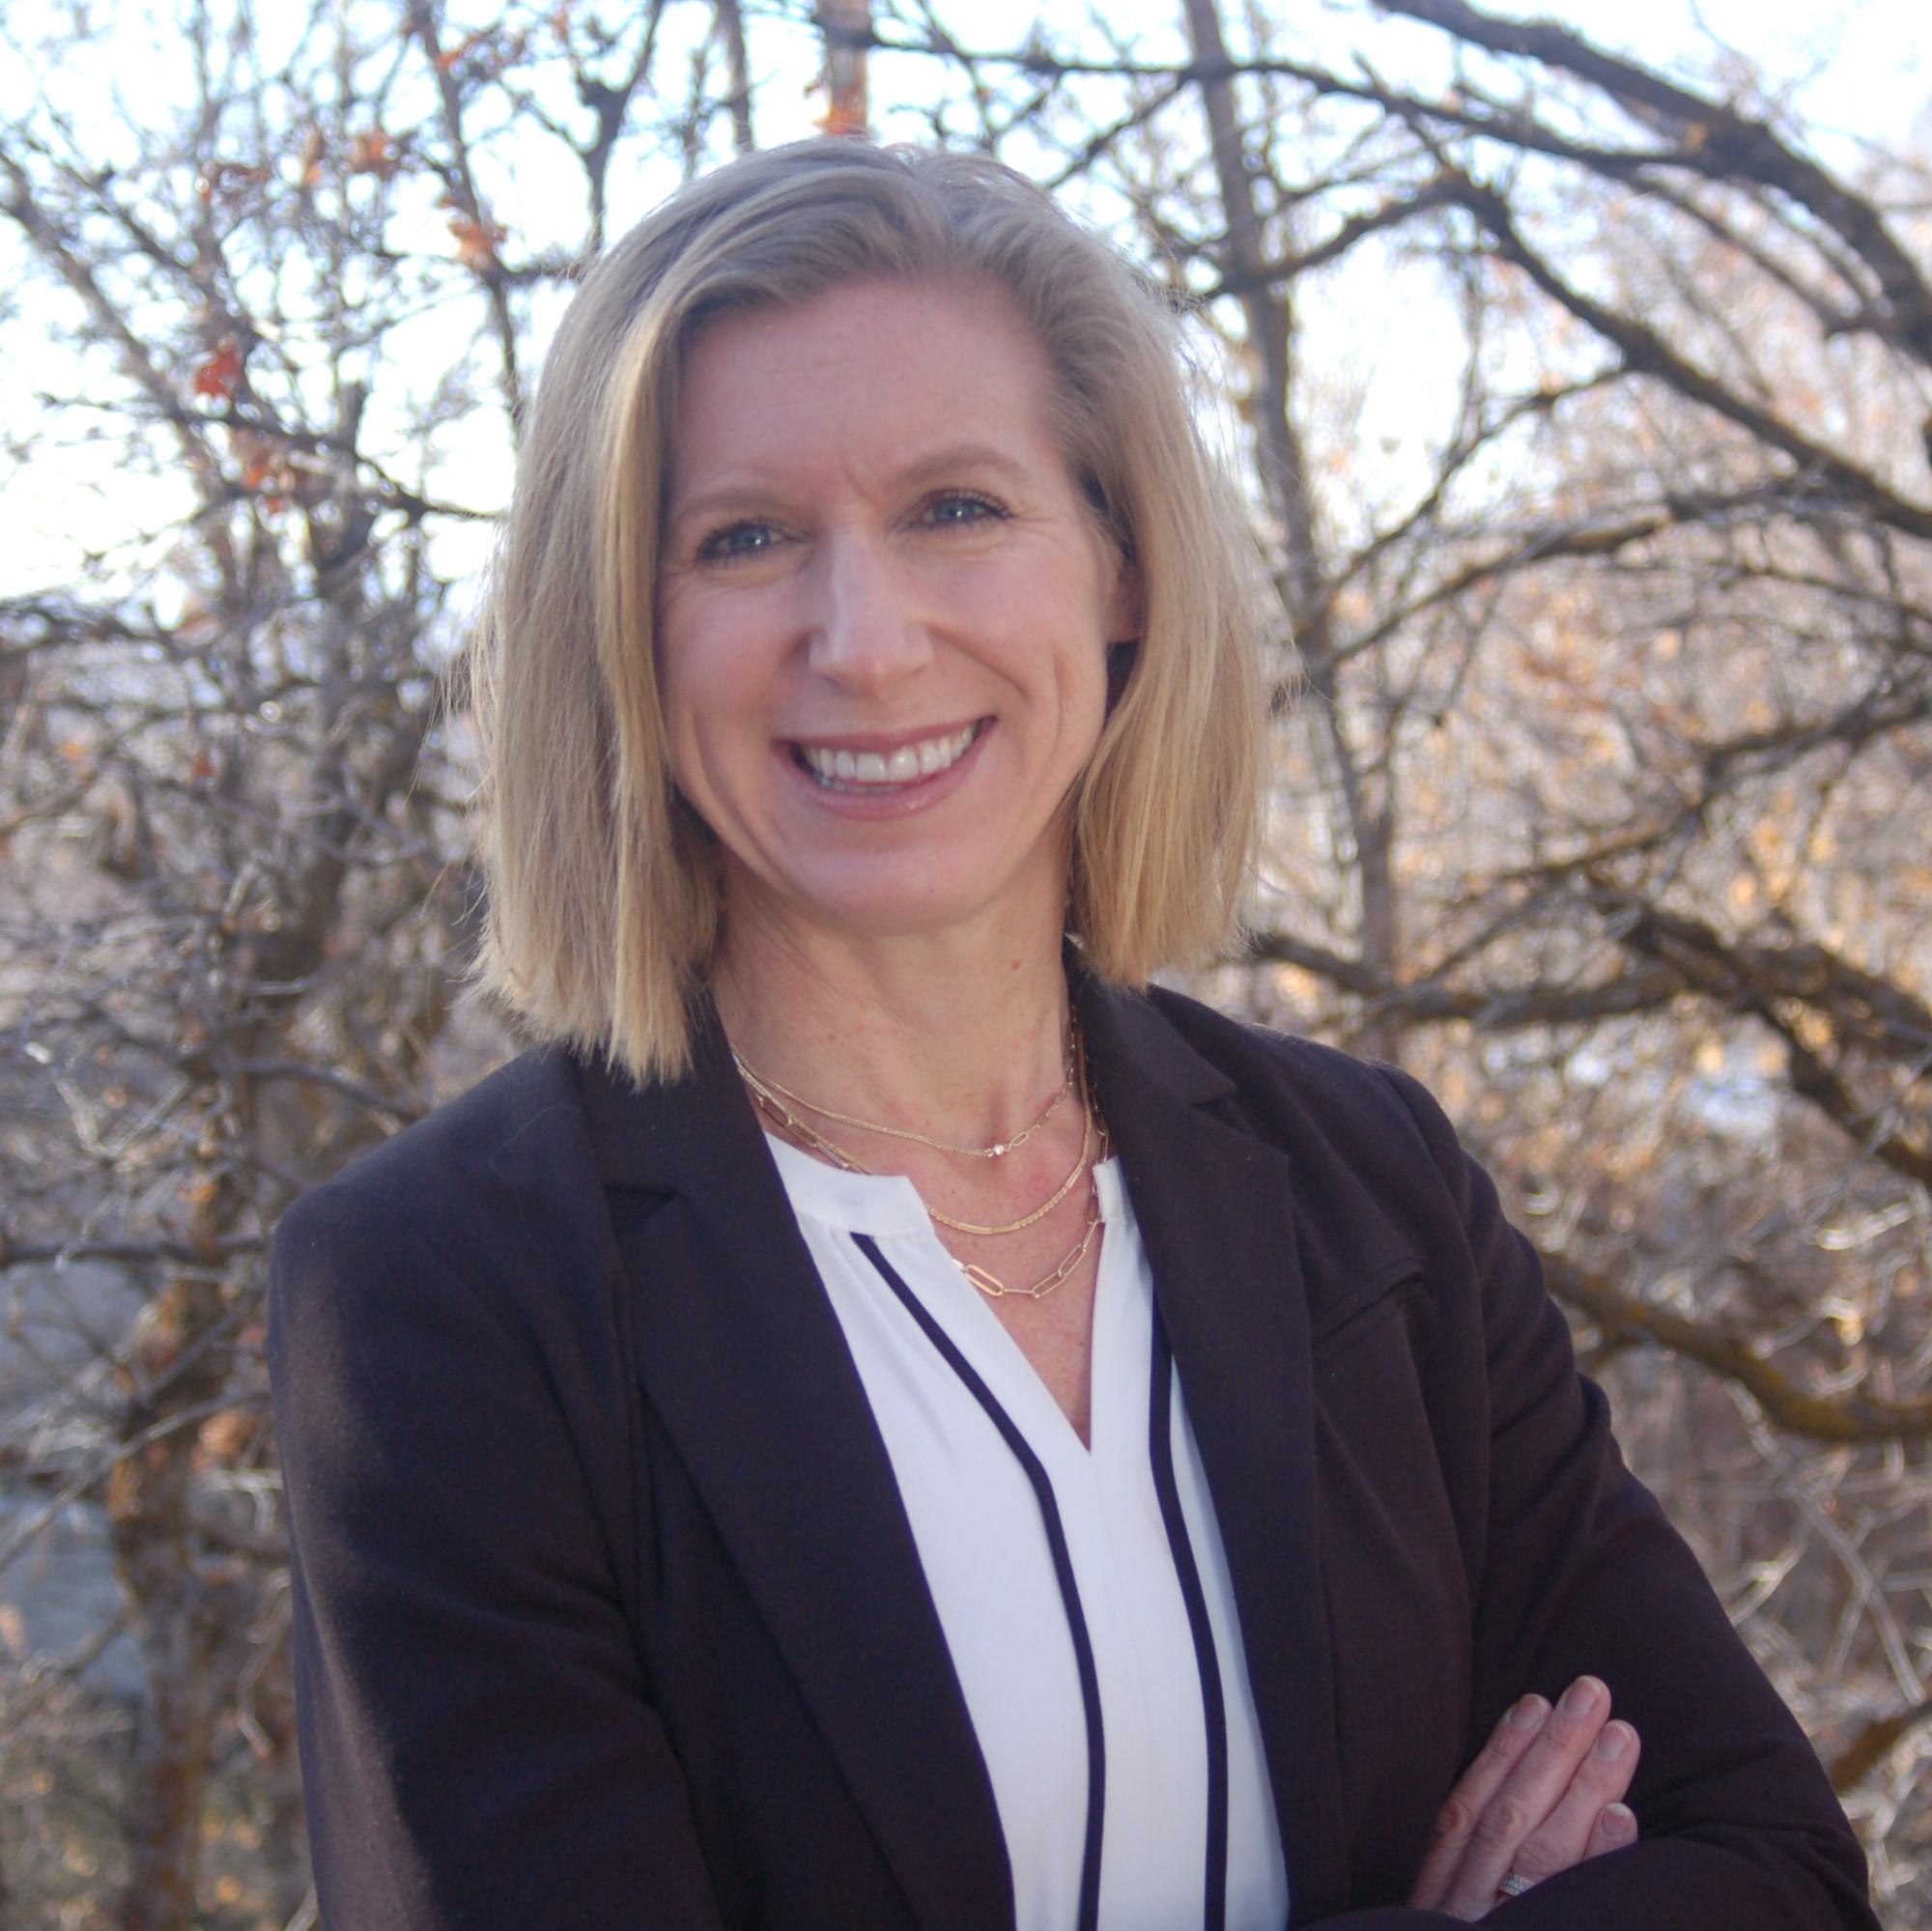 Katrina Grantz, Assistant Regional Director Upper Colorado Basin